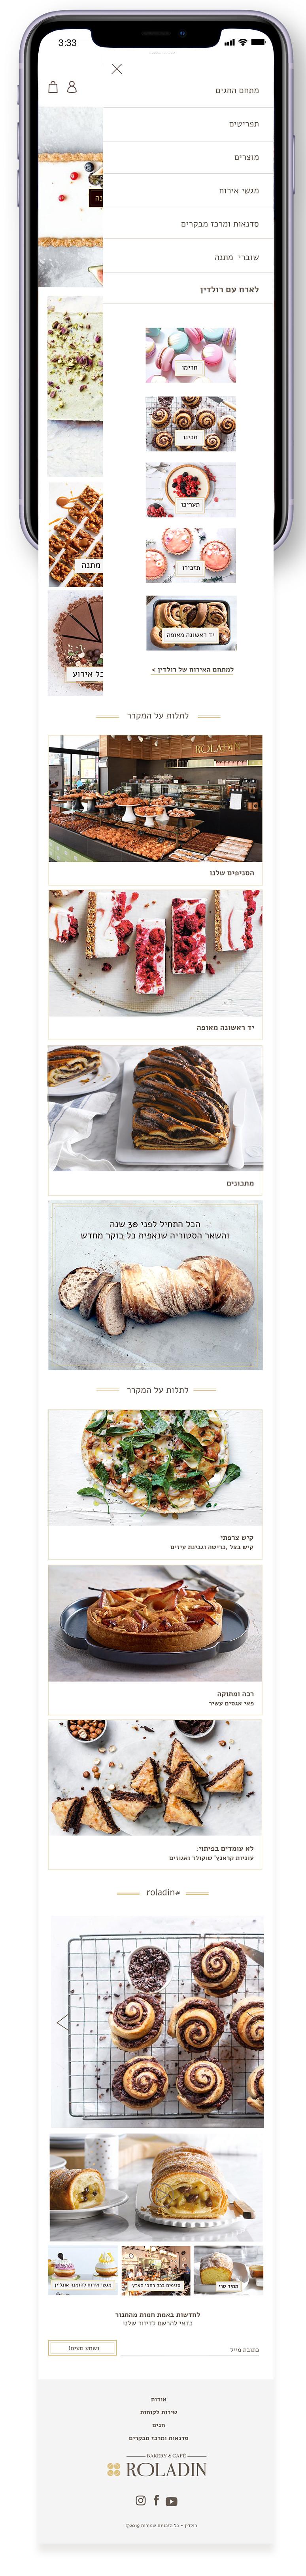 iPhone menu.jpg